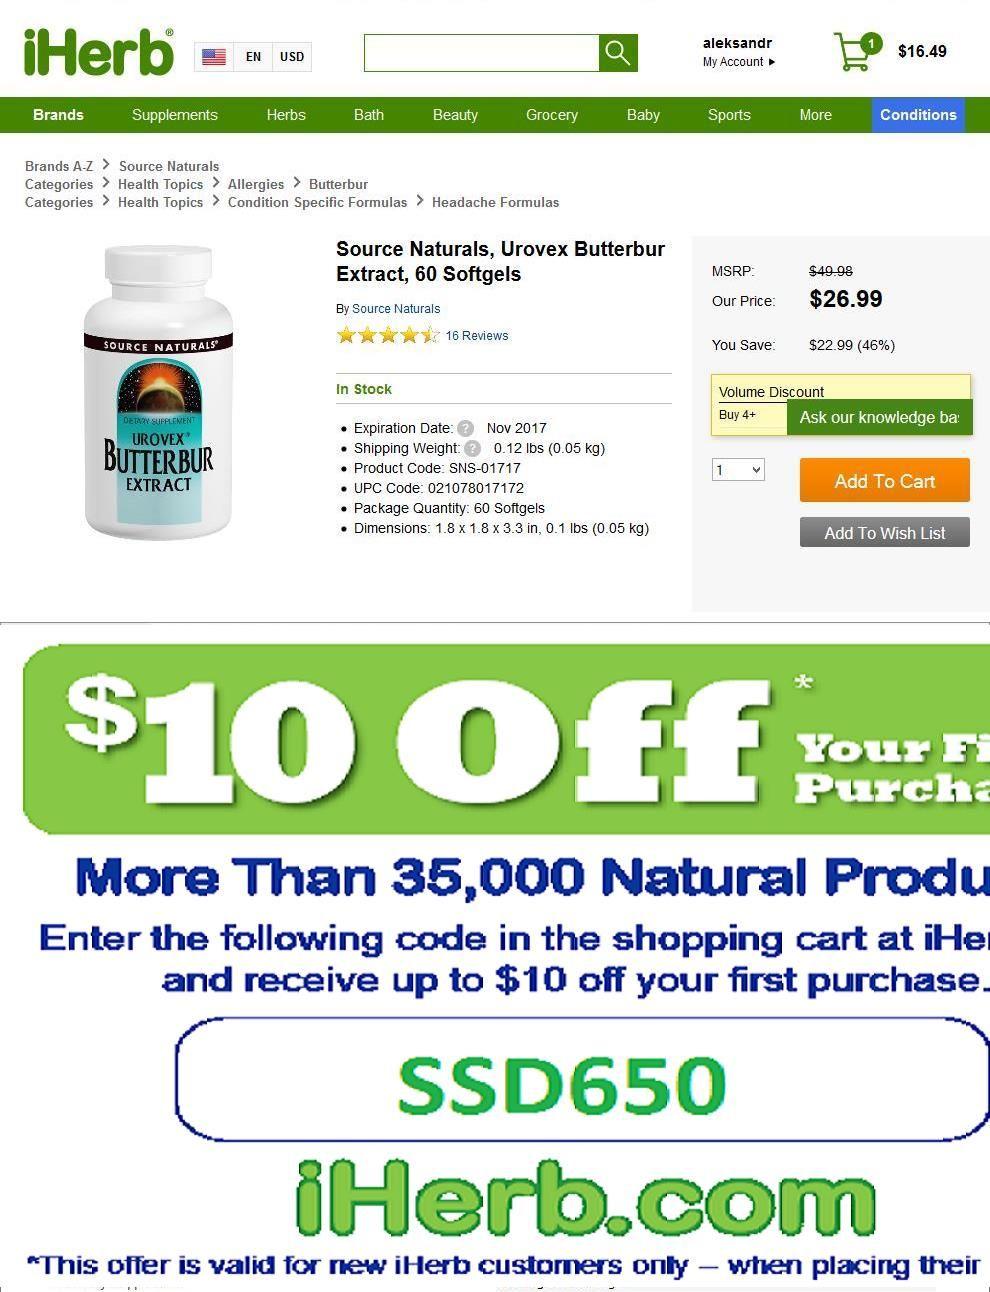 Source Naturals, Urovex Butterbur Extract, 60 Softgels   http://iherb.com/Source-Naturals-Urovex-Butterbur-Extract-60-Softgels/964